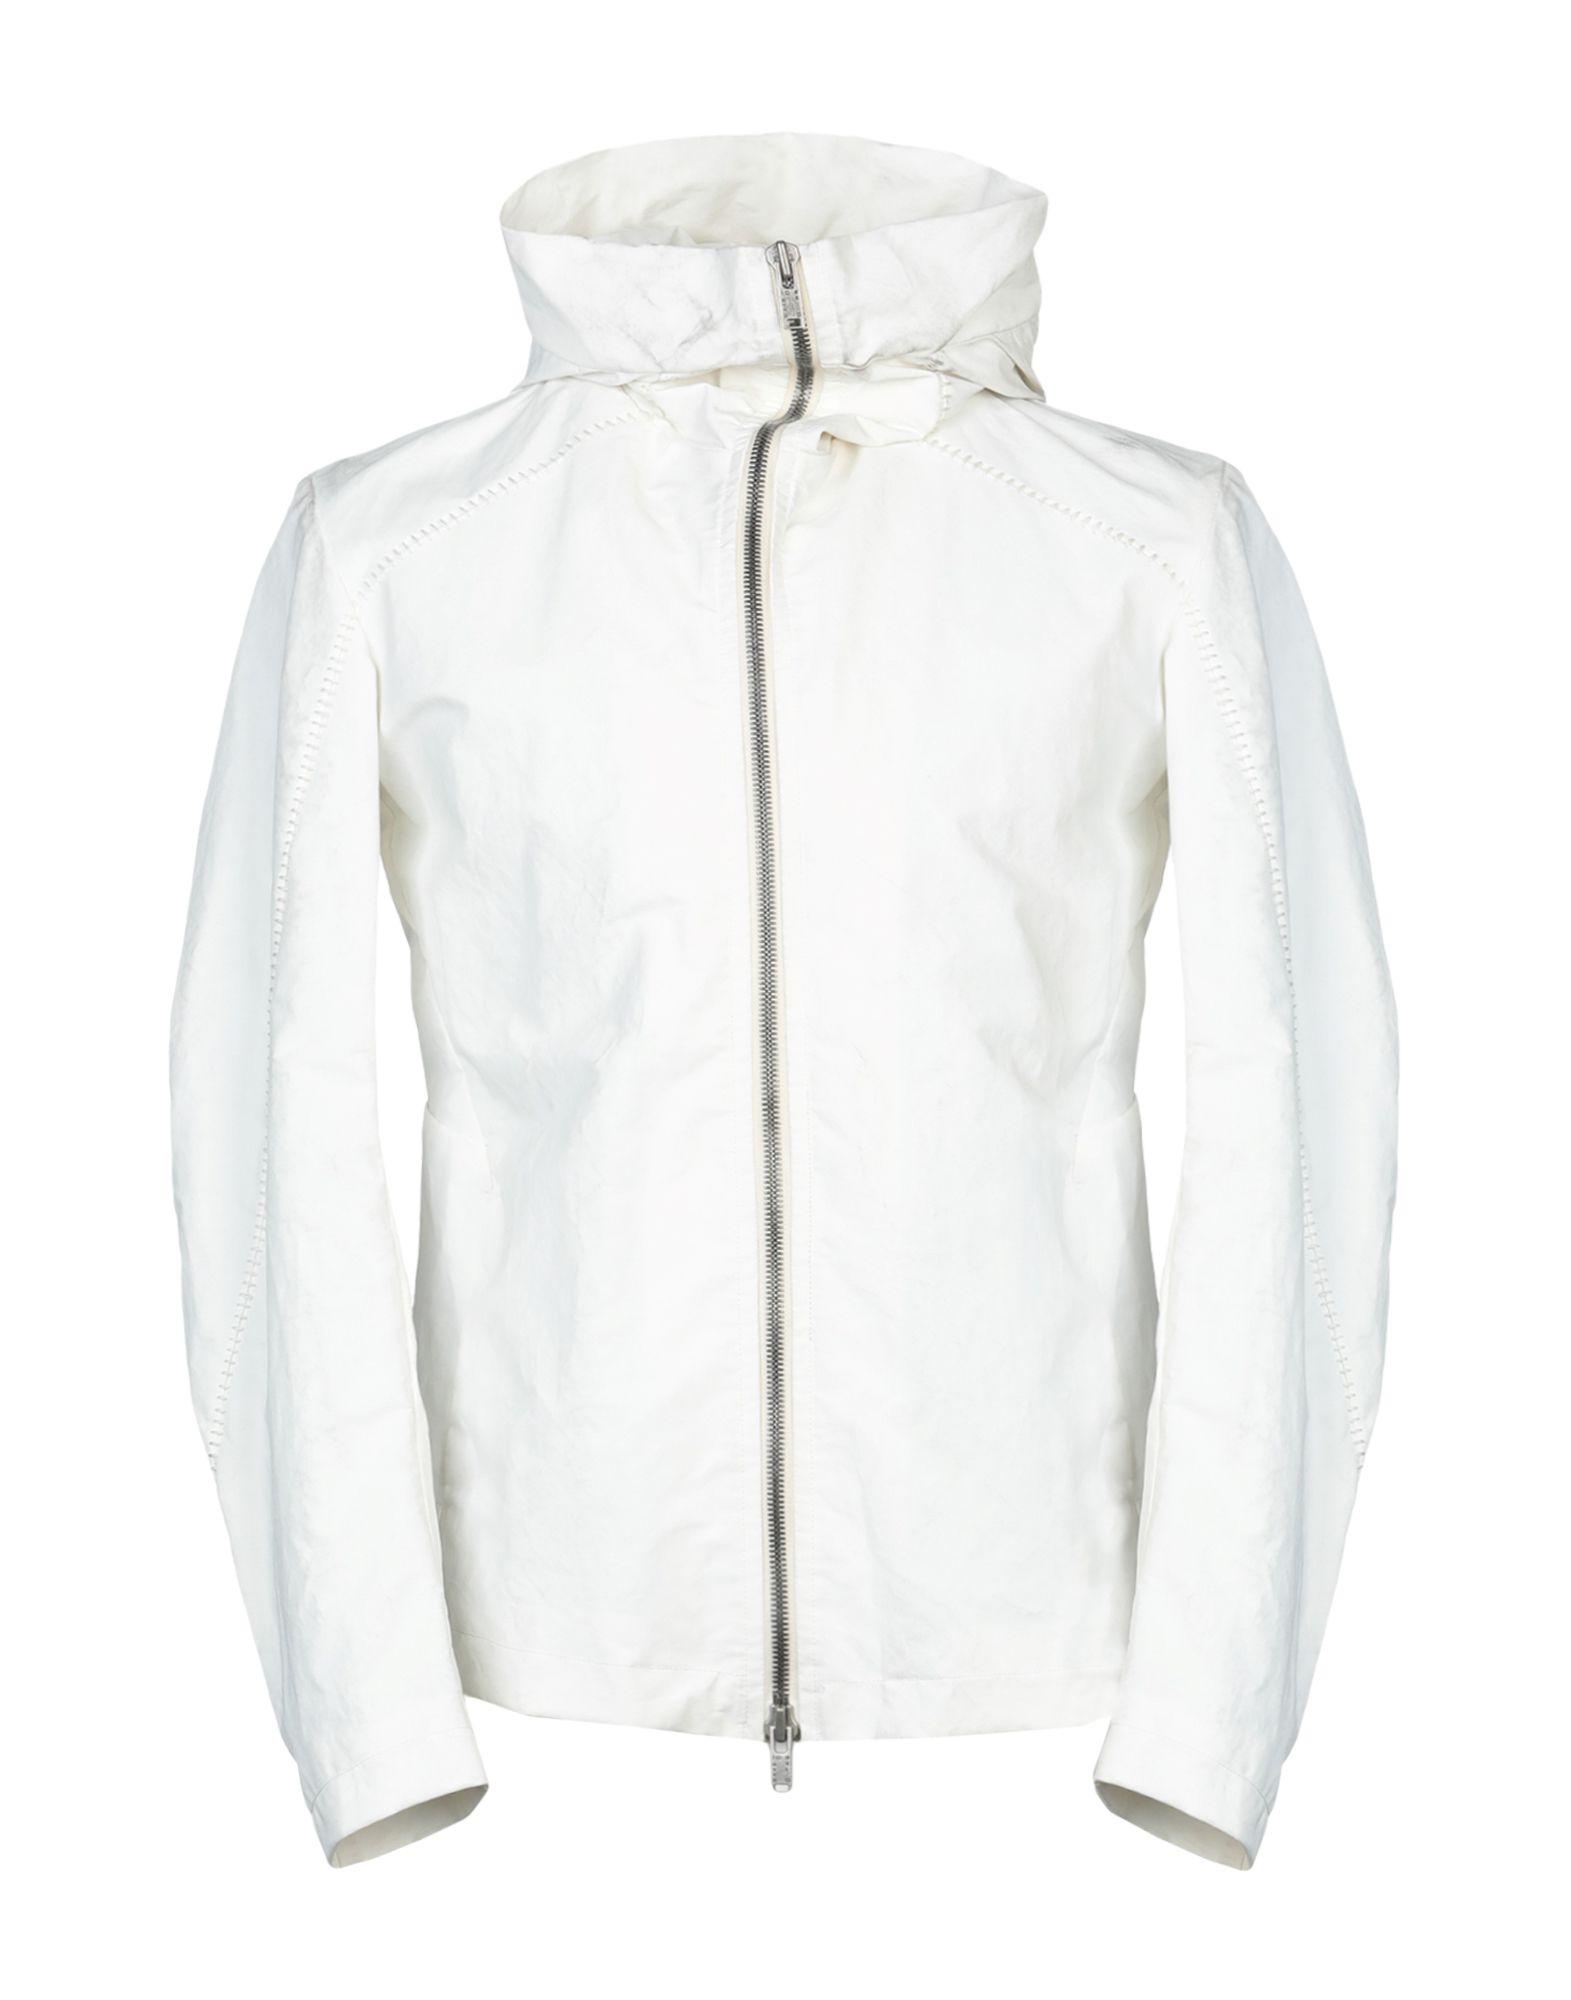 10SEI0OTTO Куртка 10sei0otto палантин